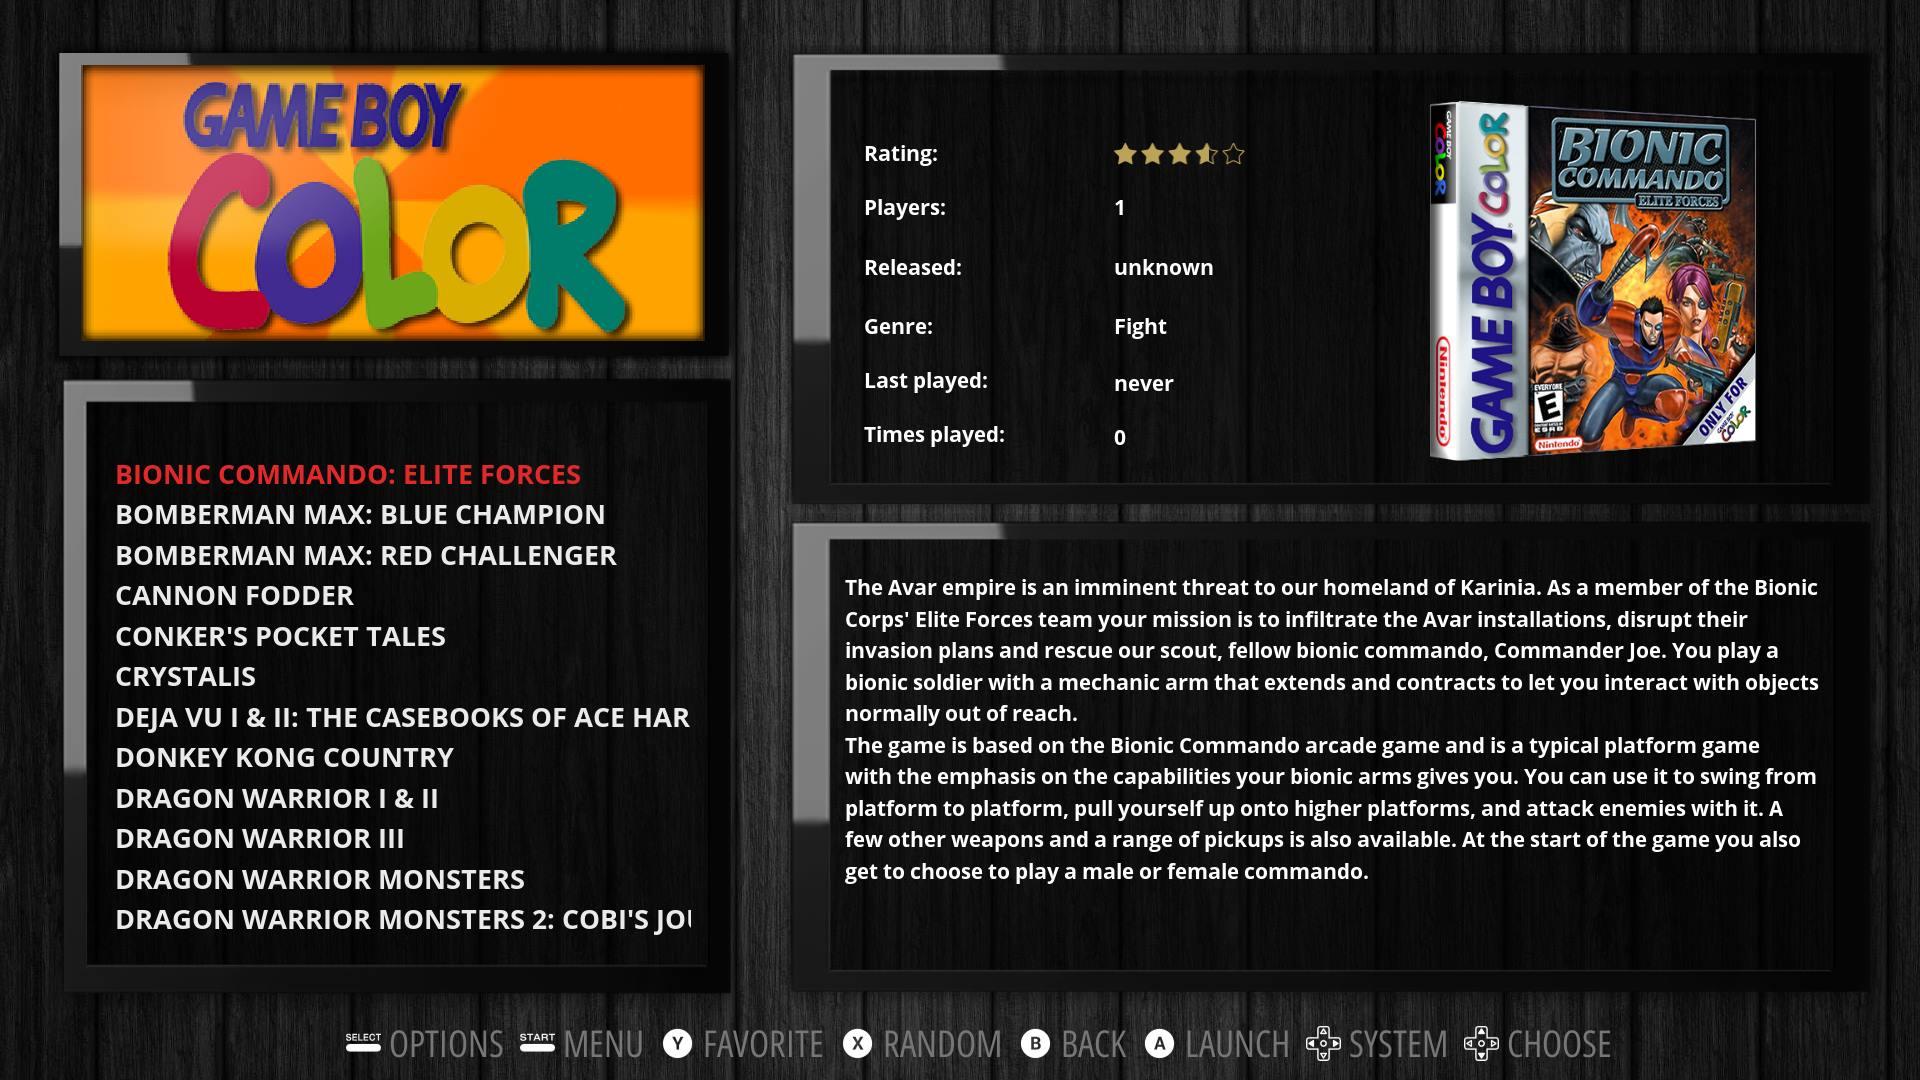 New theme] Super Display - RetroPie Forum